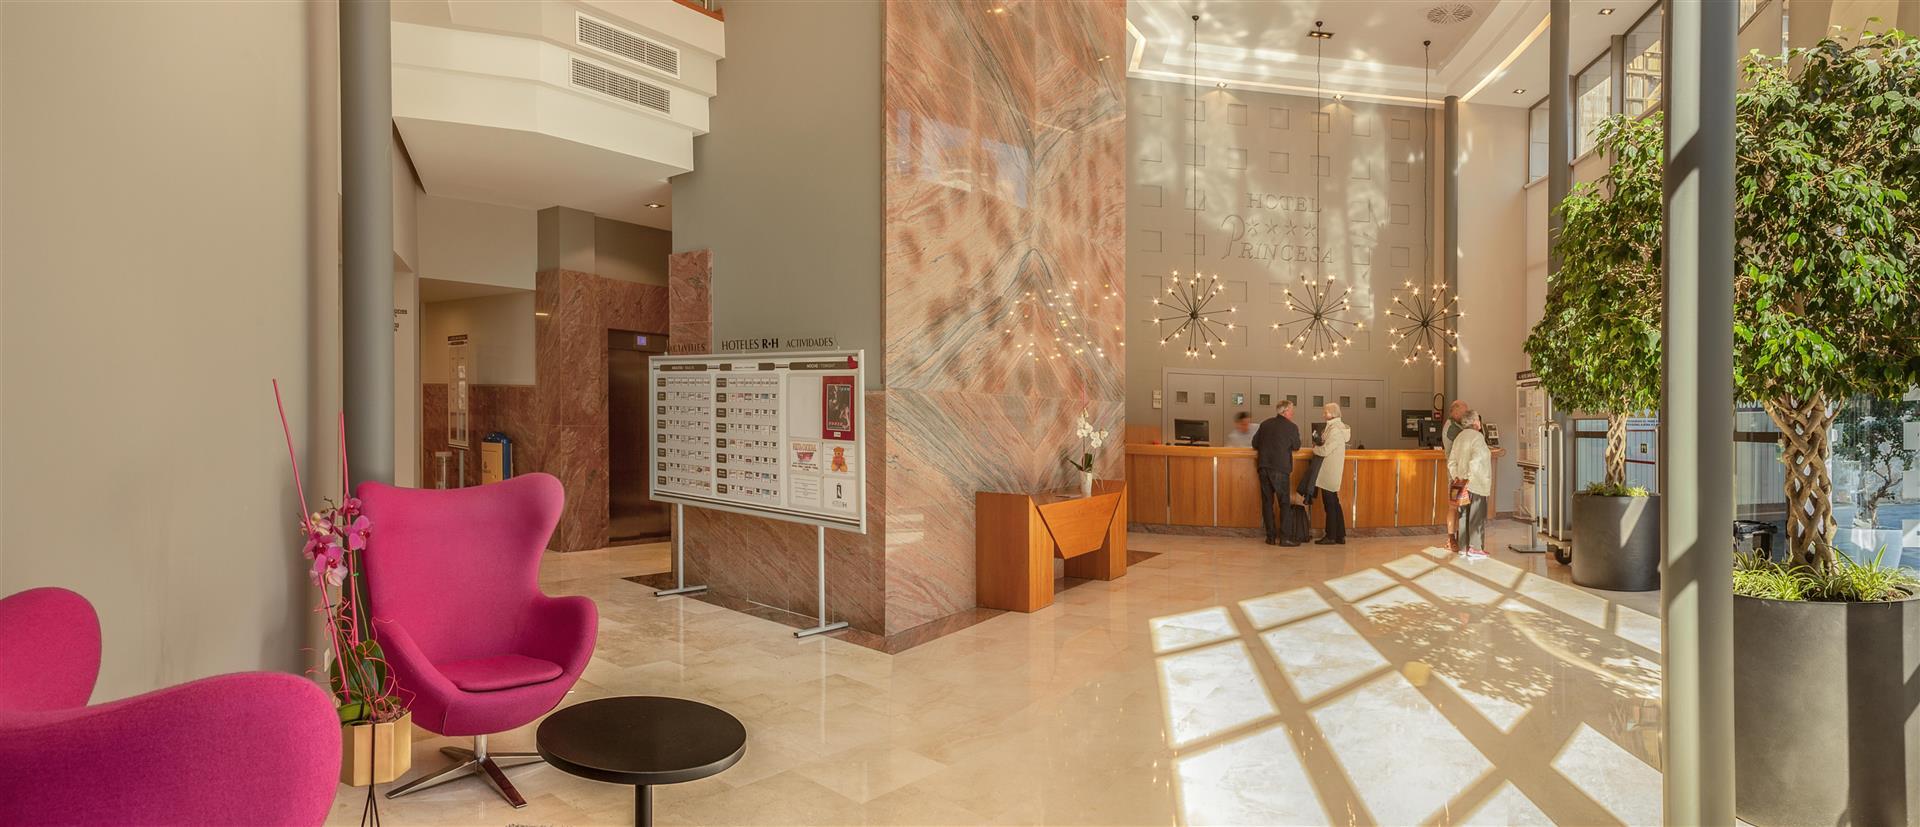 Солимар отель коста бланка бенидорм